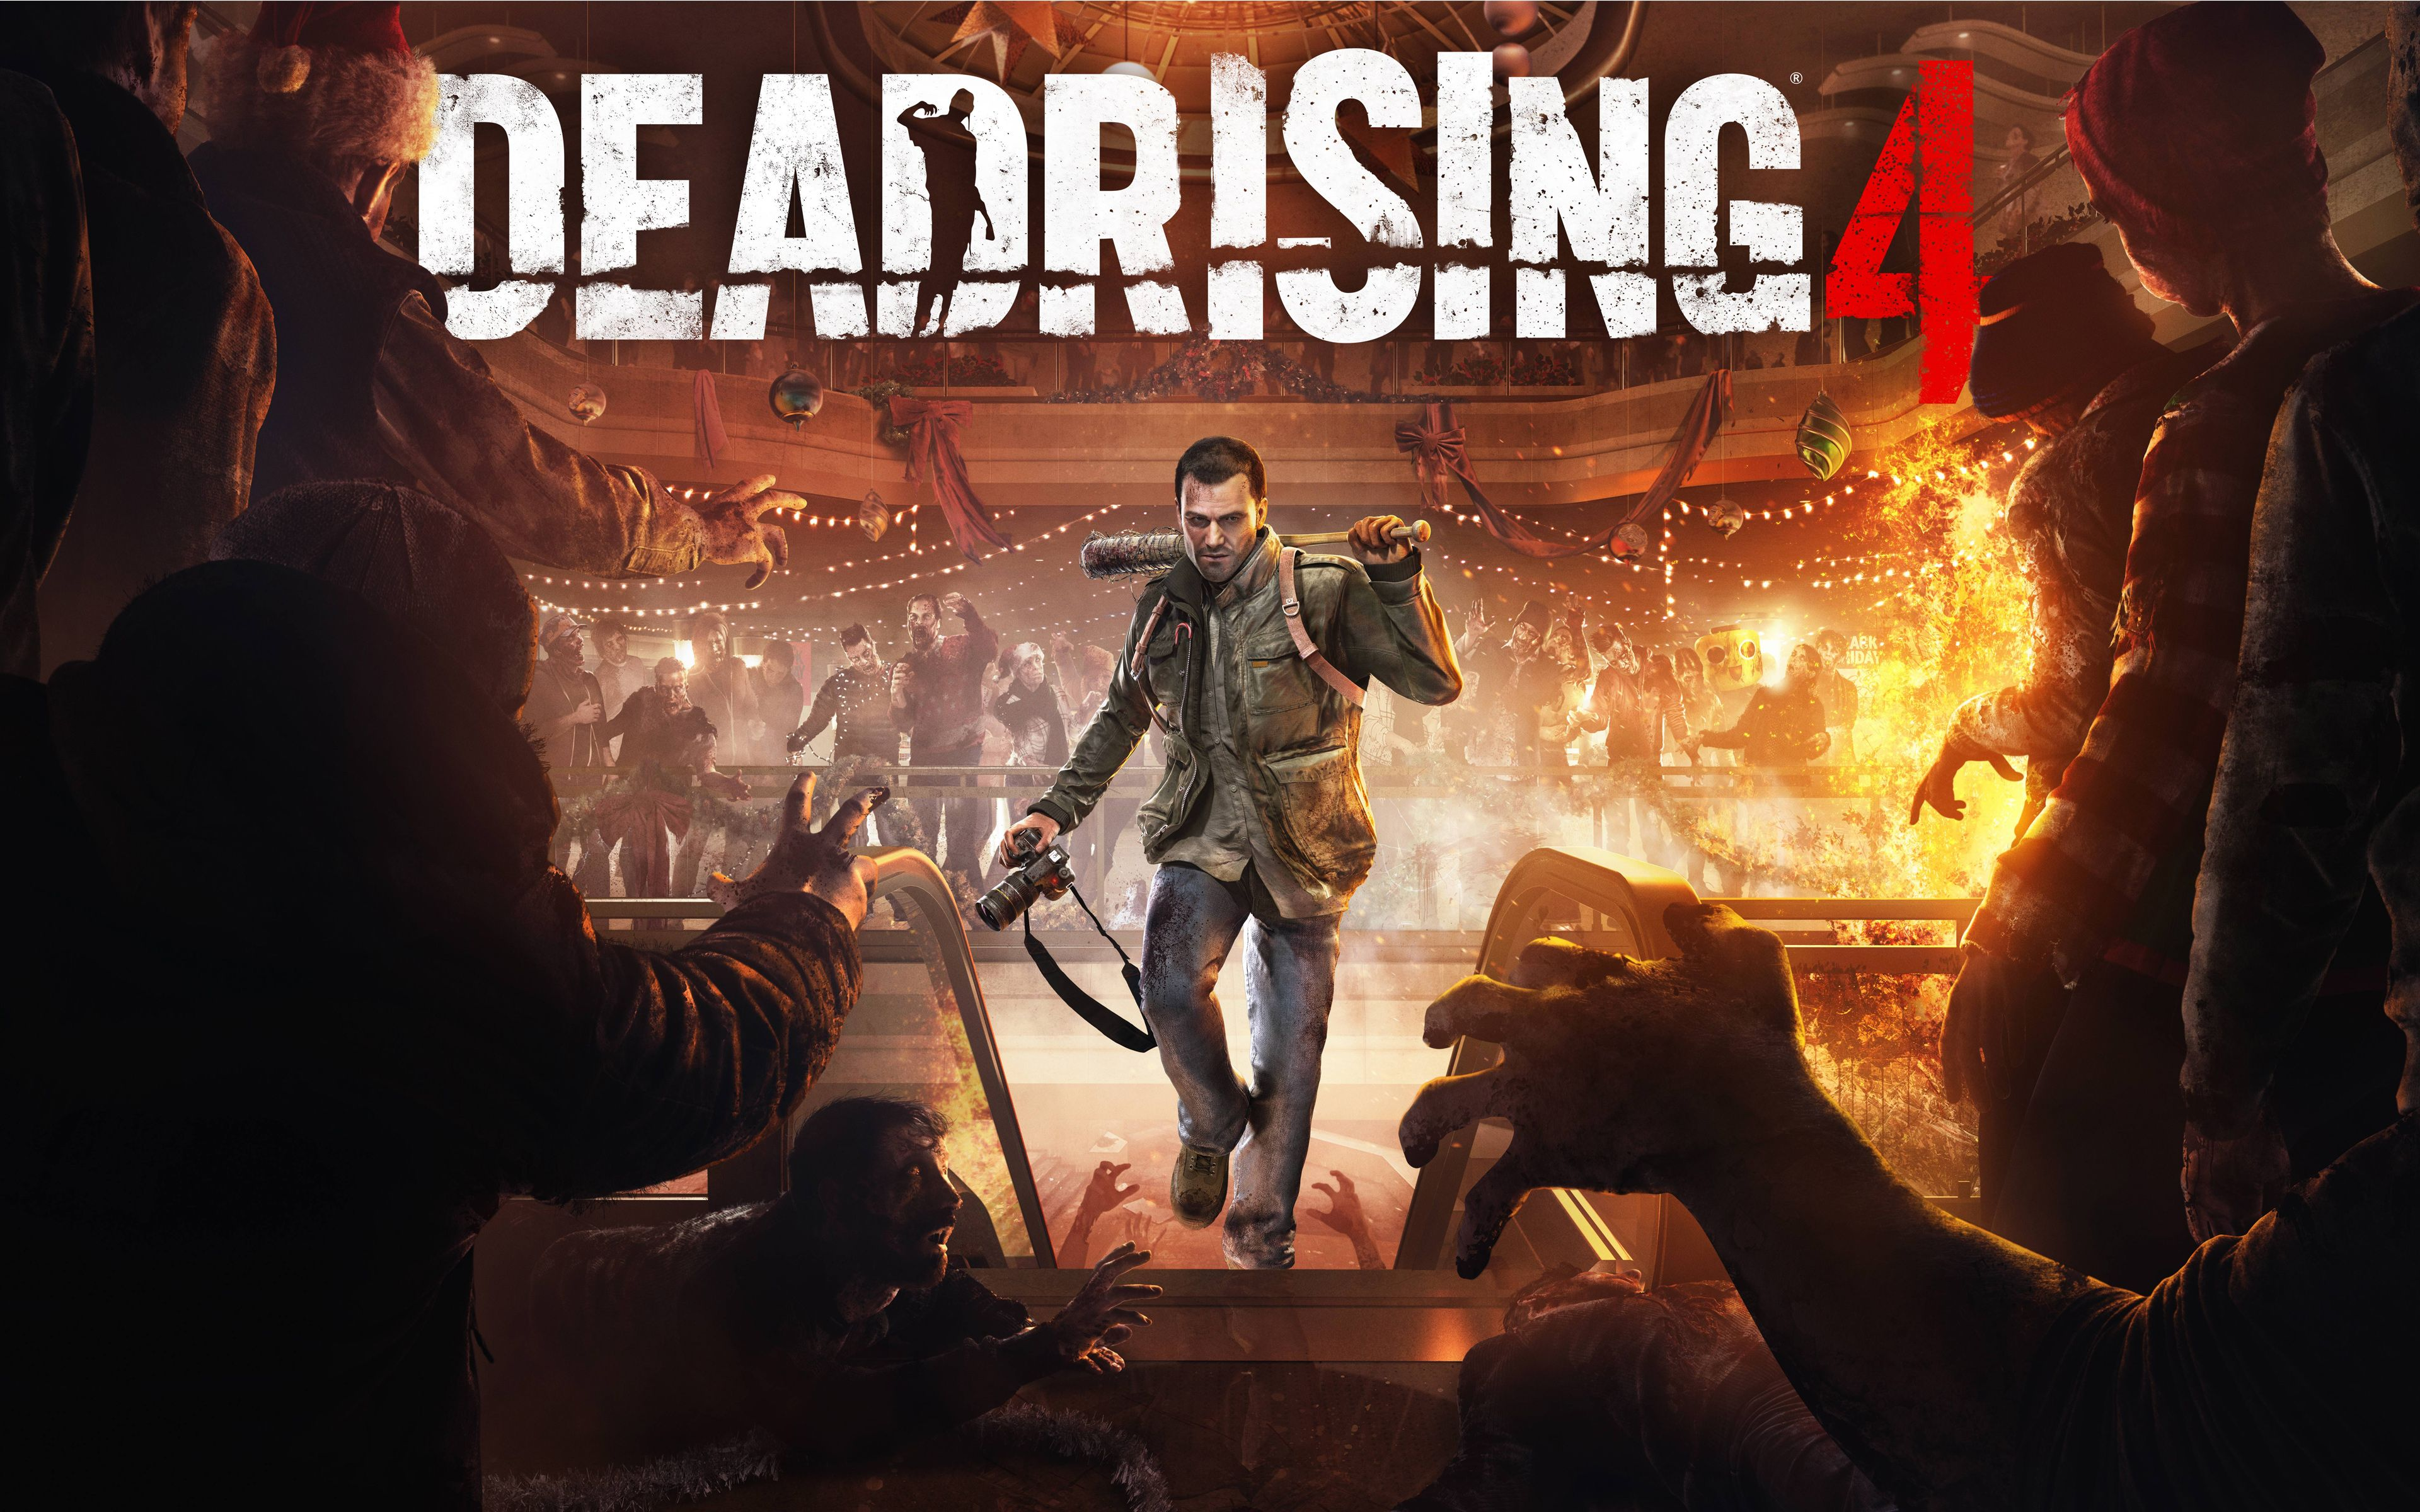 Dead Rising 4 Game https://www.facebook.com/Dead-Rising-4-Club-183833762084546  #deadrising4 #deadrising4game #deadrising4games #adventuregames